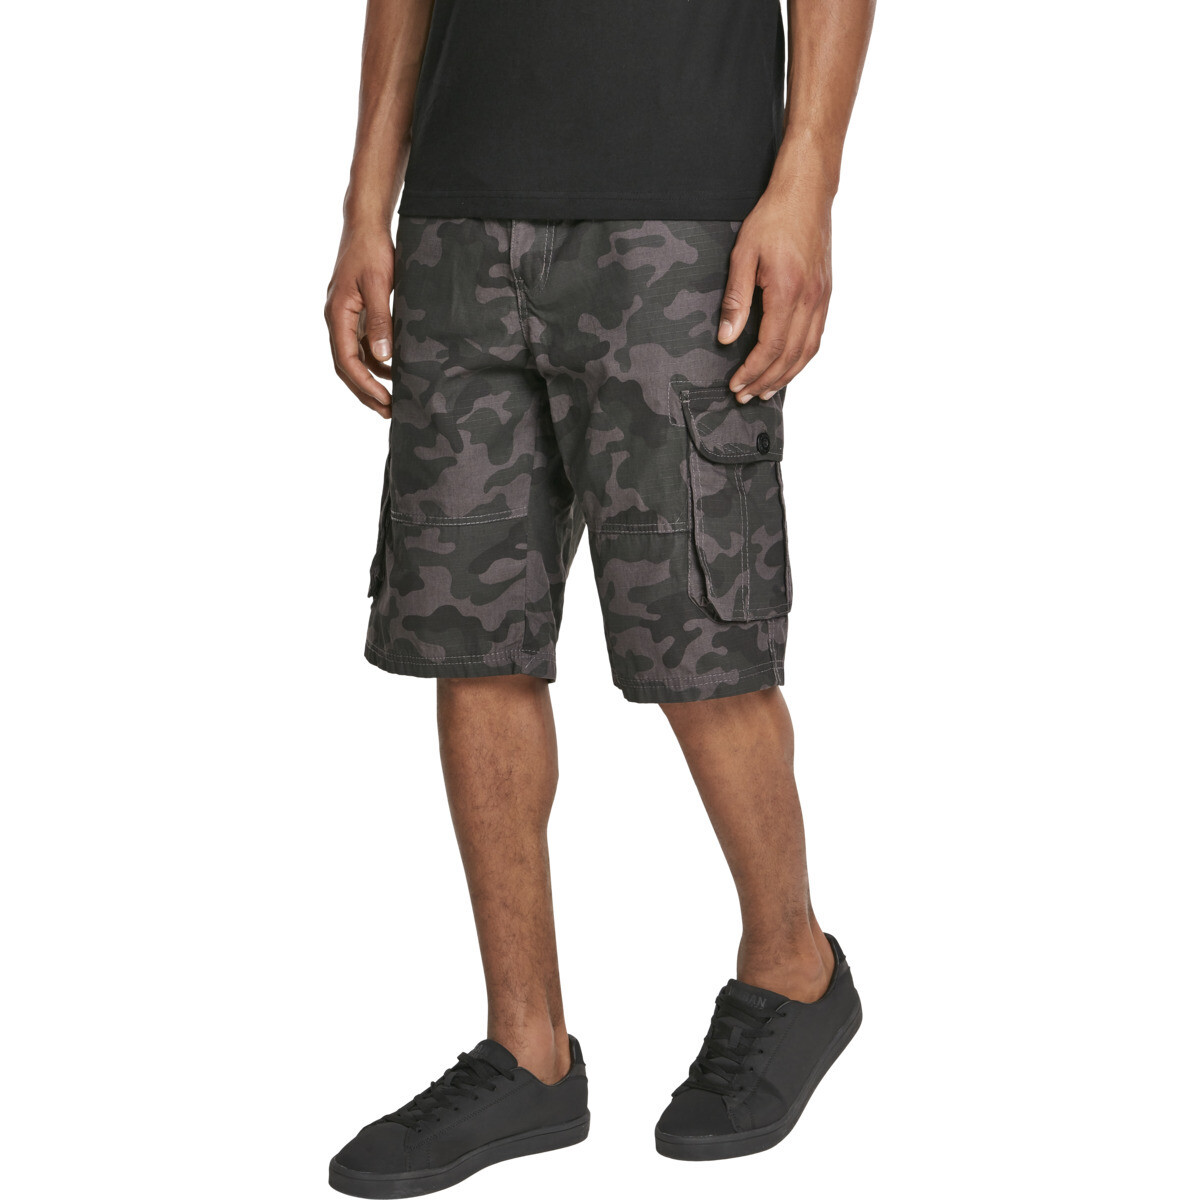 Belted Camo Cargo Shorts Ripstop - Grey Camo